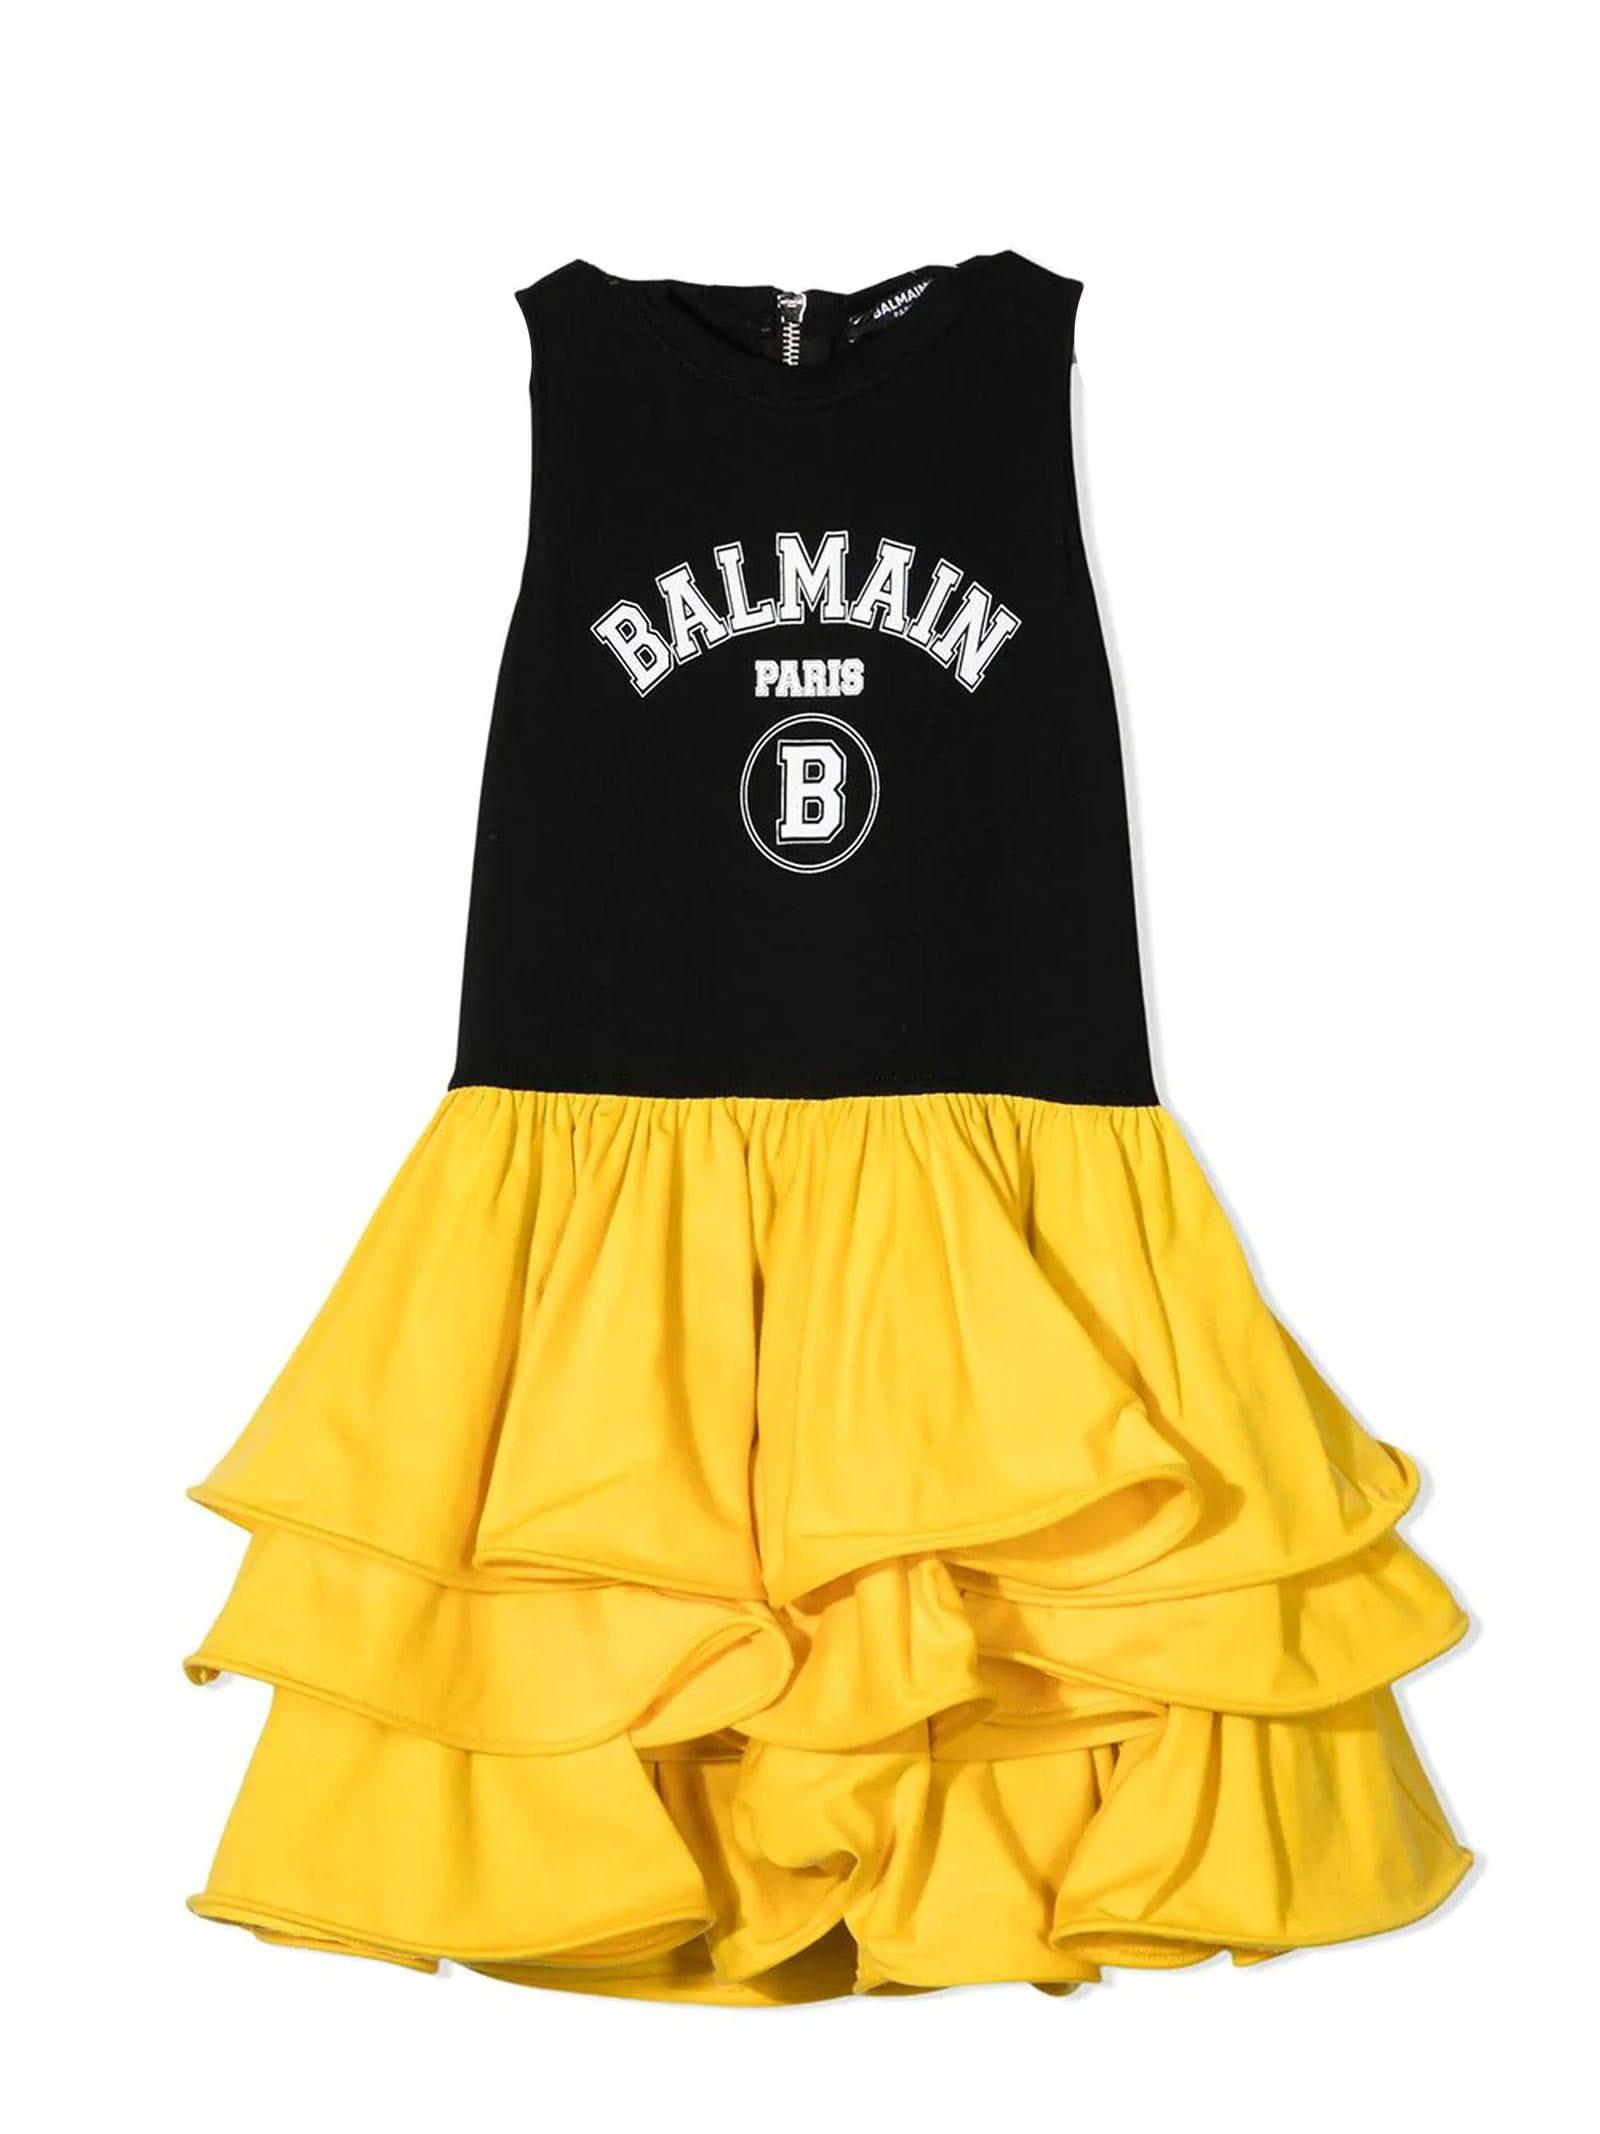 Balmain Cottons BLACK AND YELLOW COTTON DRESS